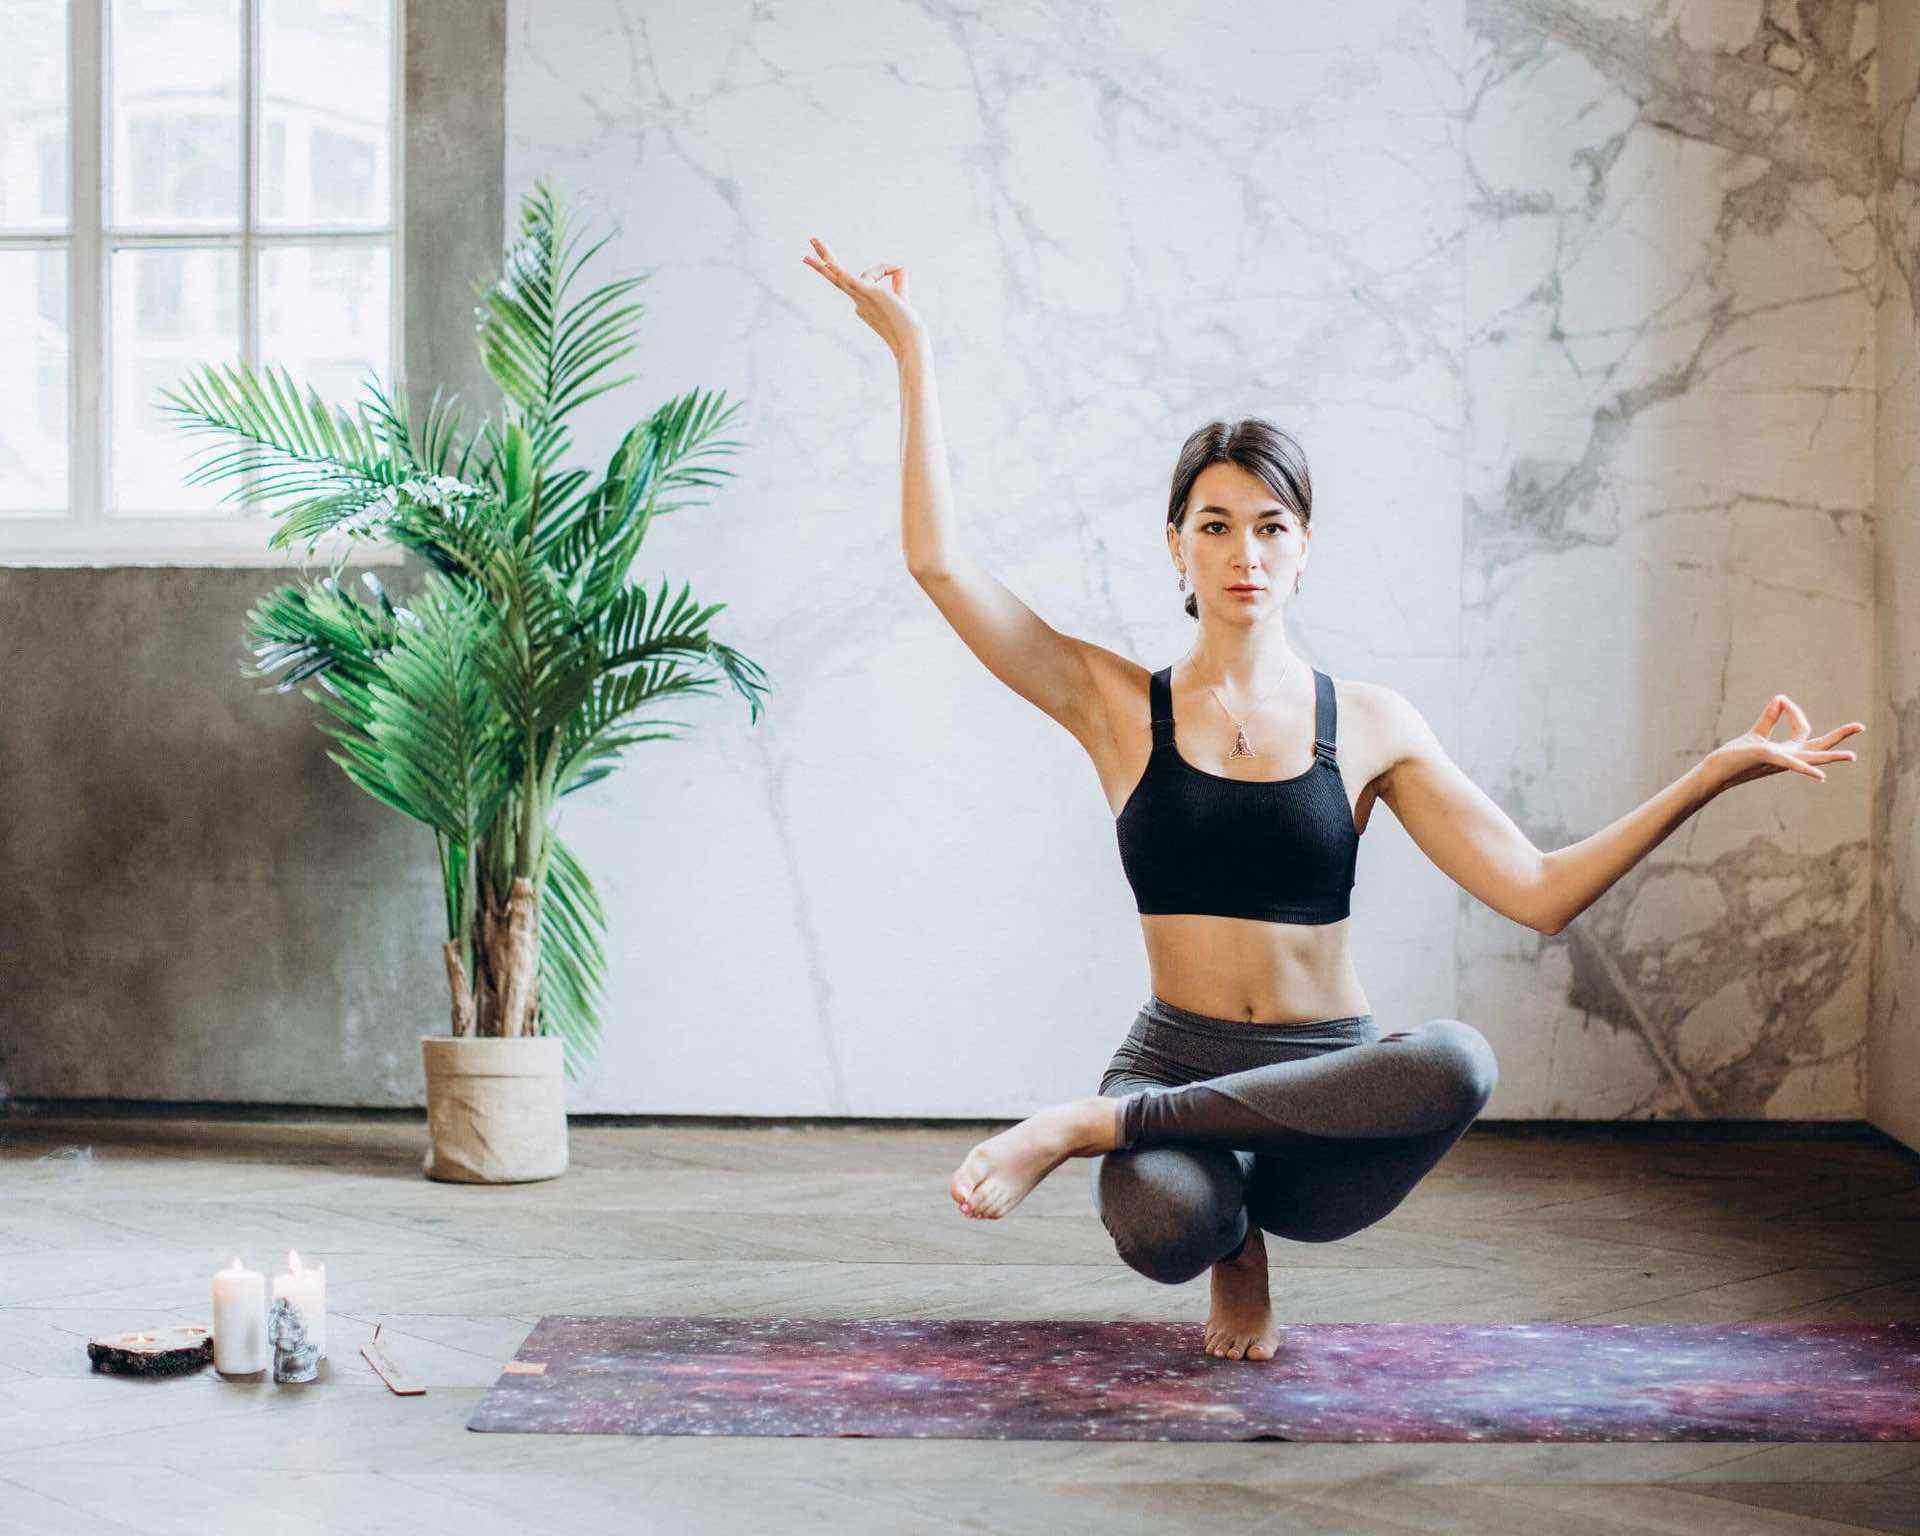 bysohealthy-naturopathie-yoga